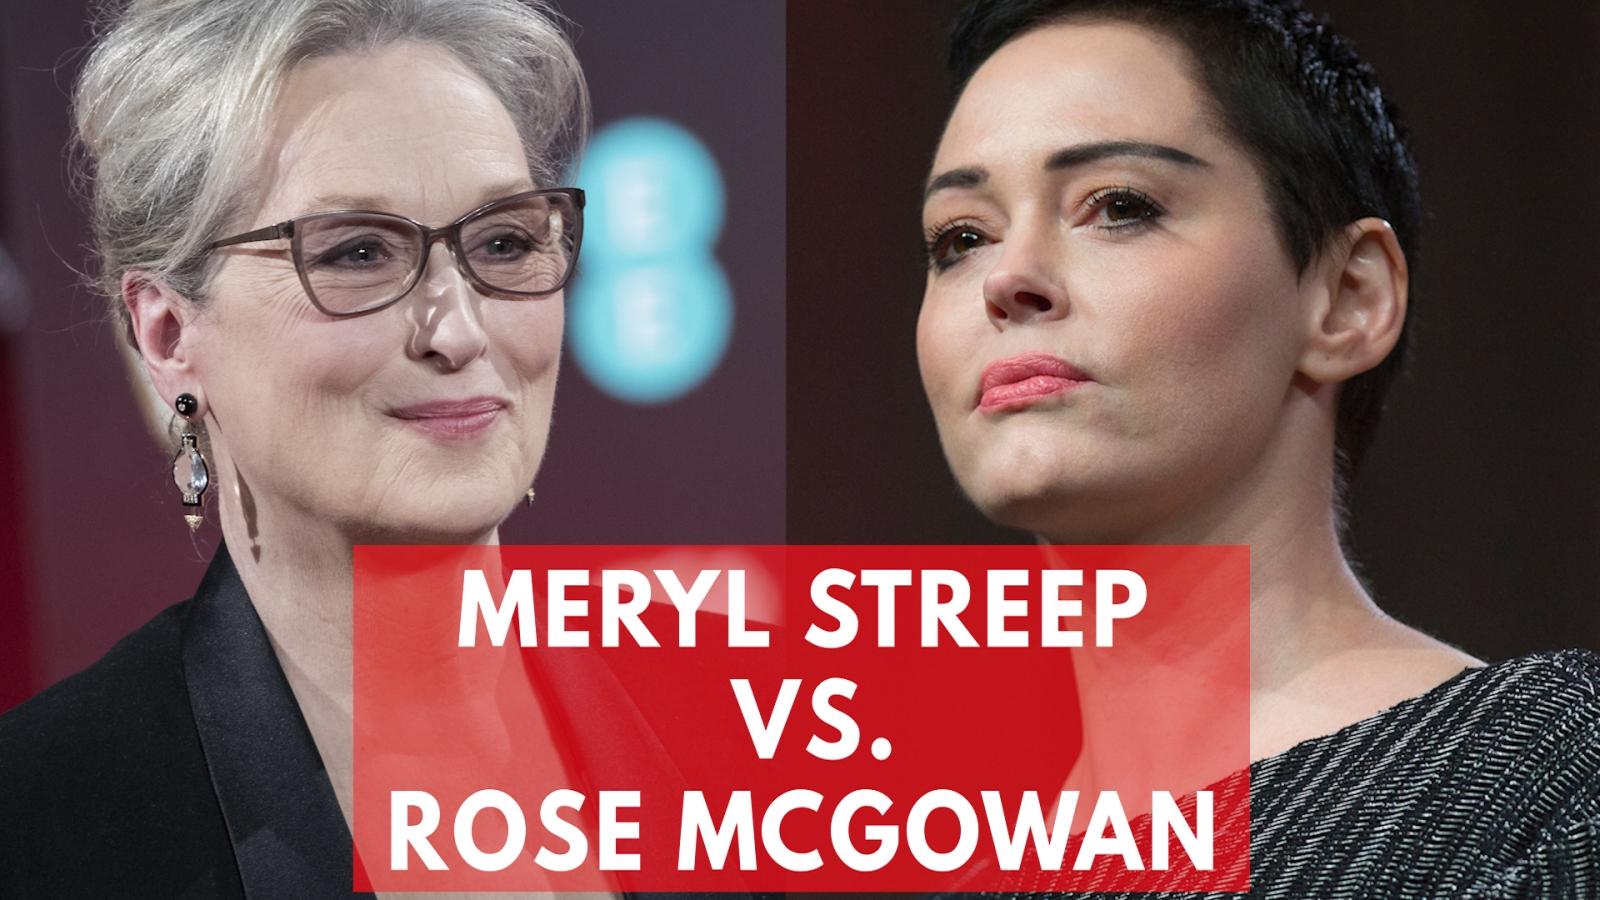 meryl-streep-responds-to-rose-mcgowan-accusations